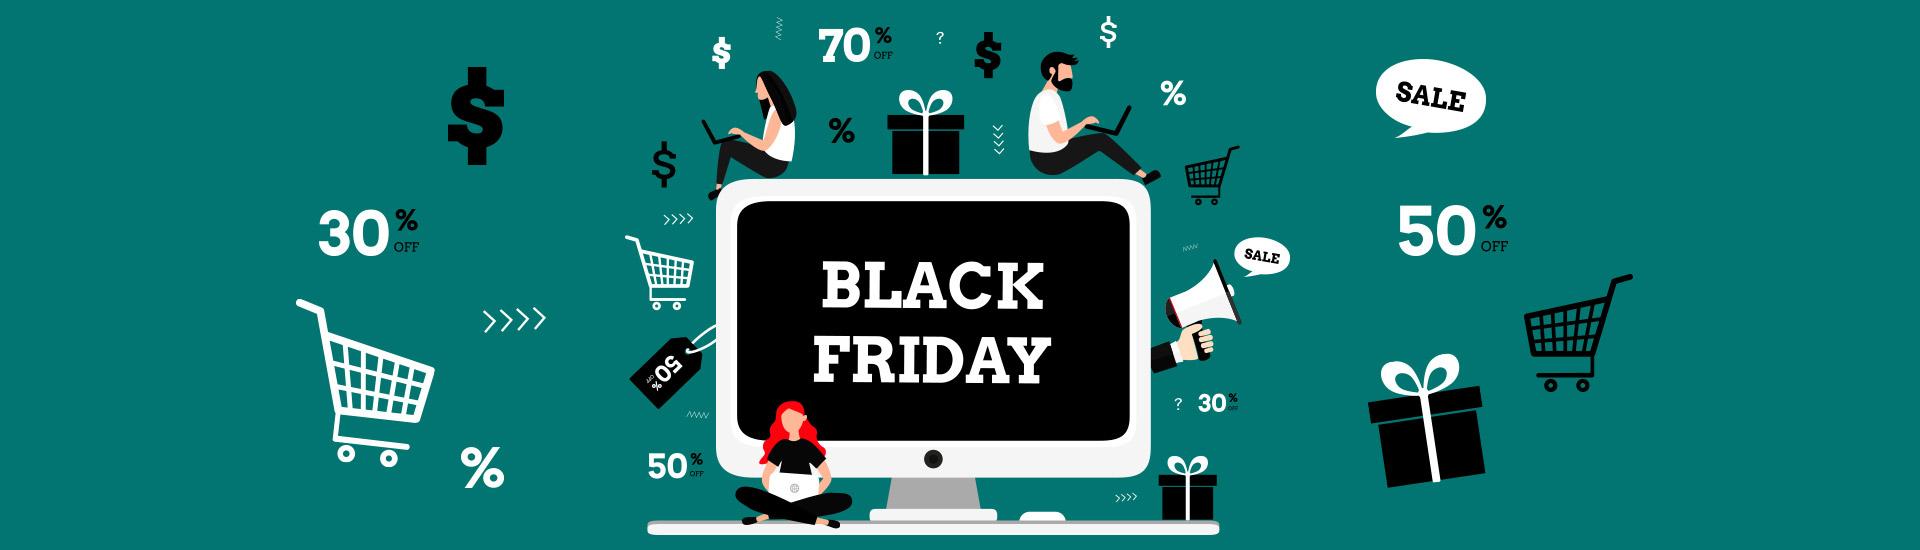 Black Friday-Ποιες είναι οι προκλήσεις για τον κόσμο του E-Commerce ;